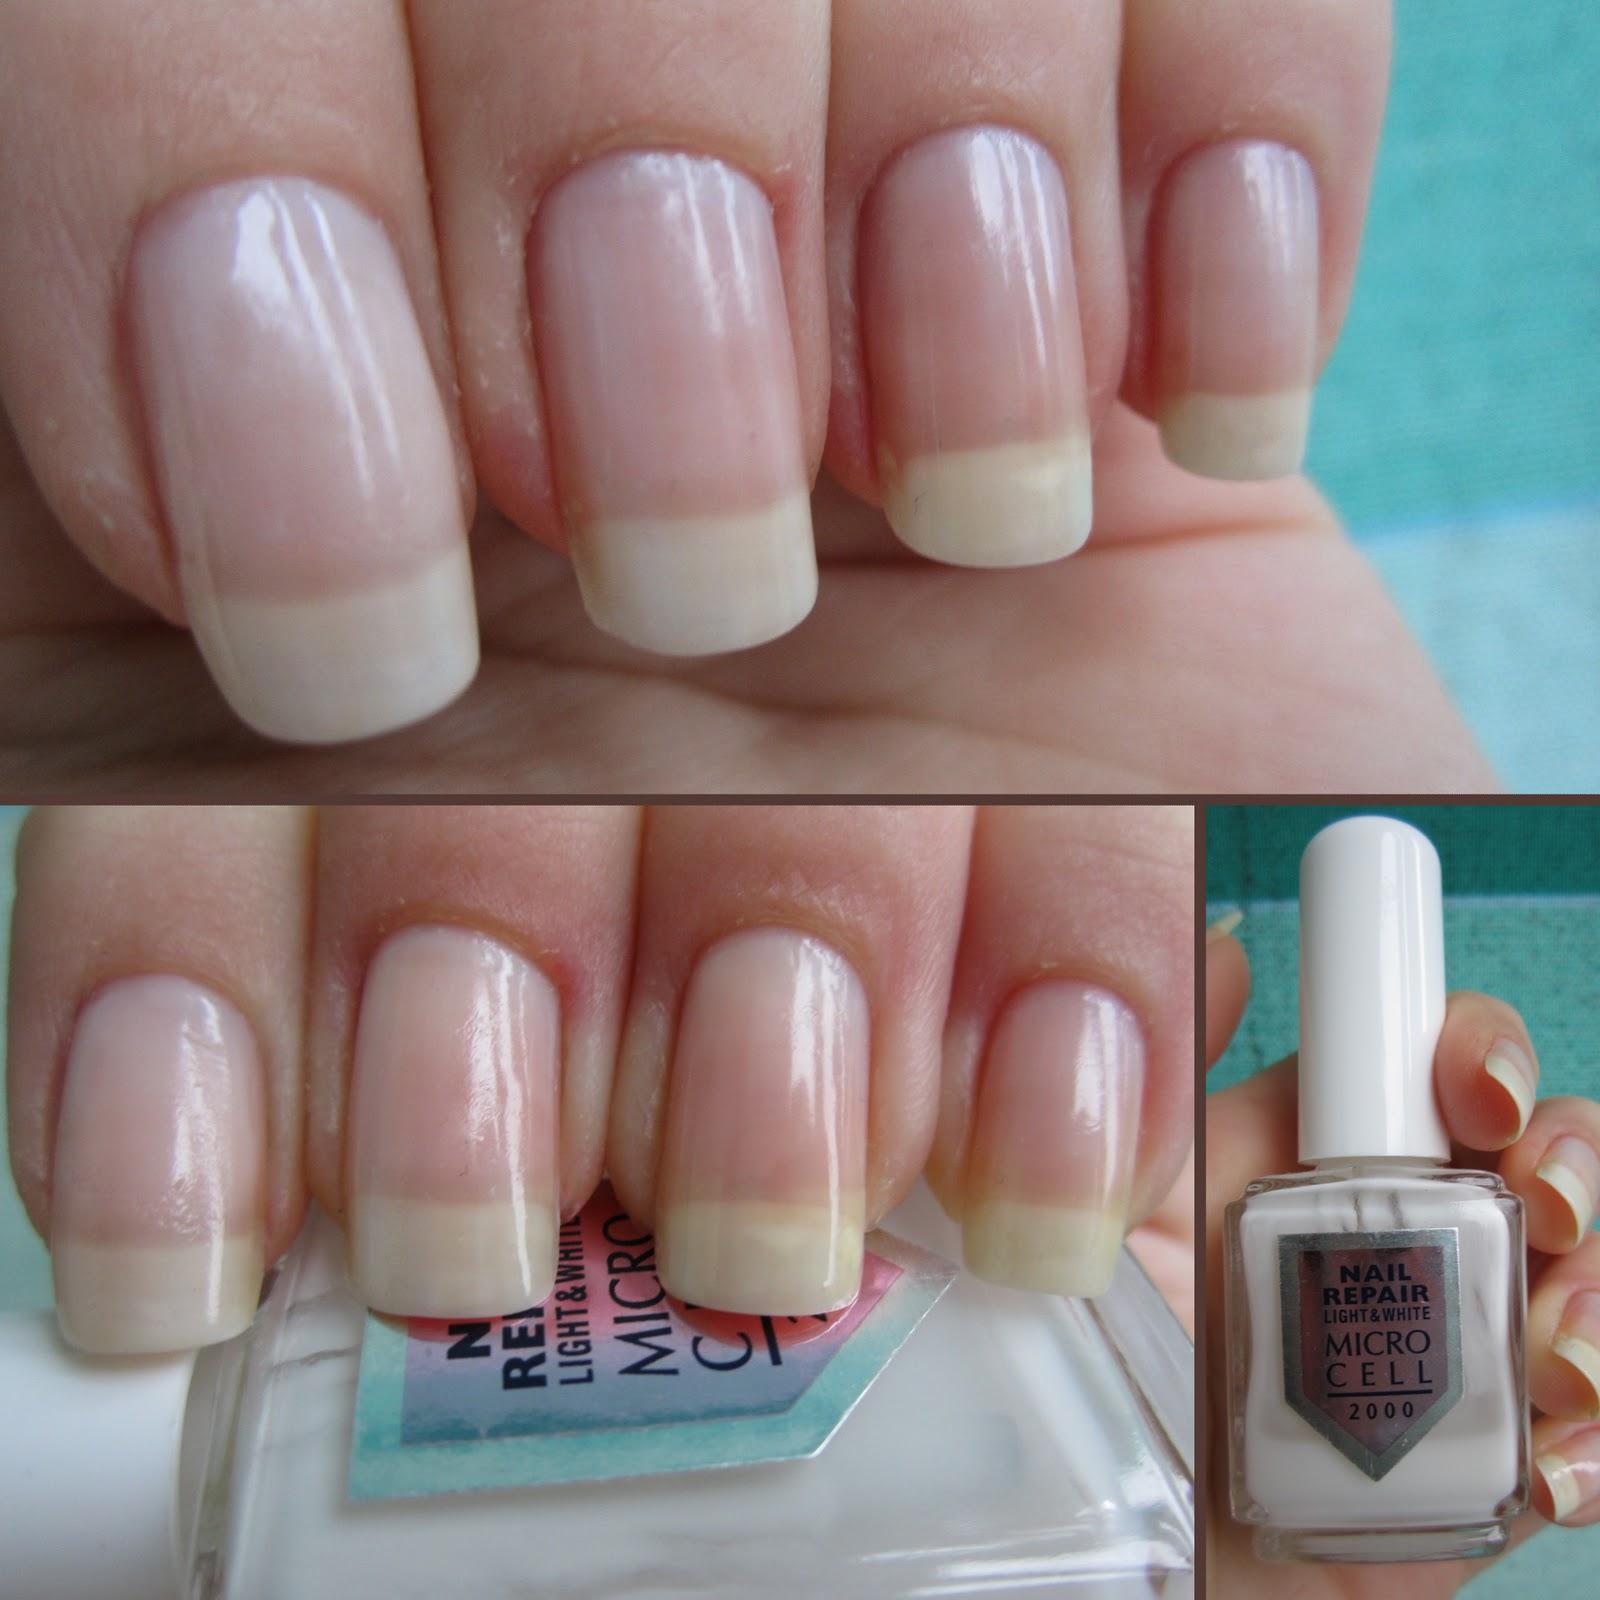 Jenaily Micro Cell 2000 Light Amp White